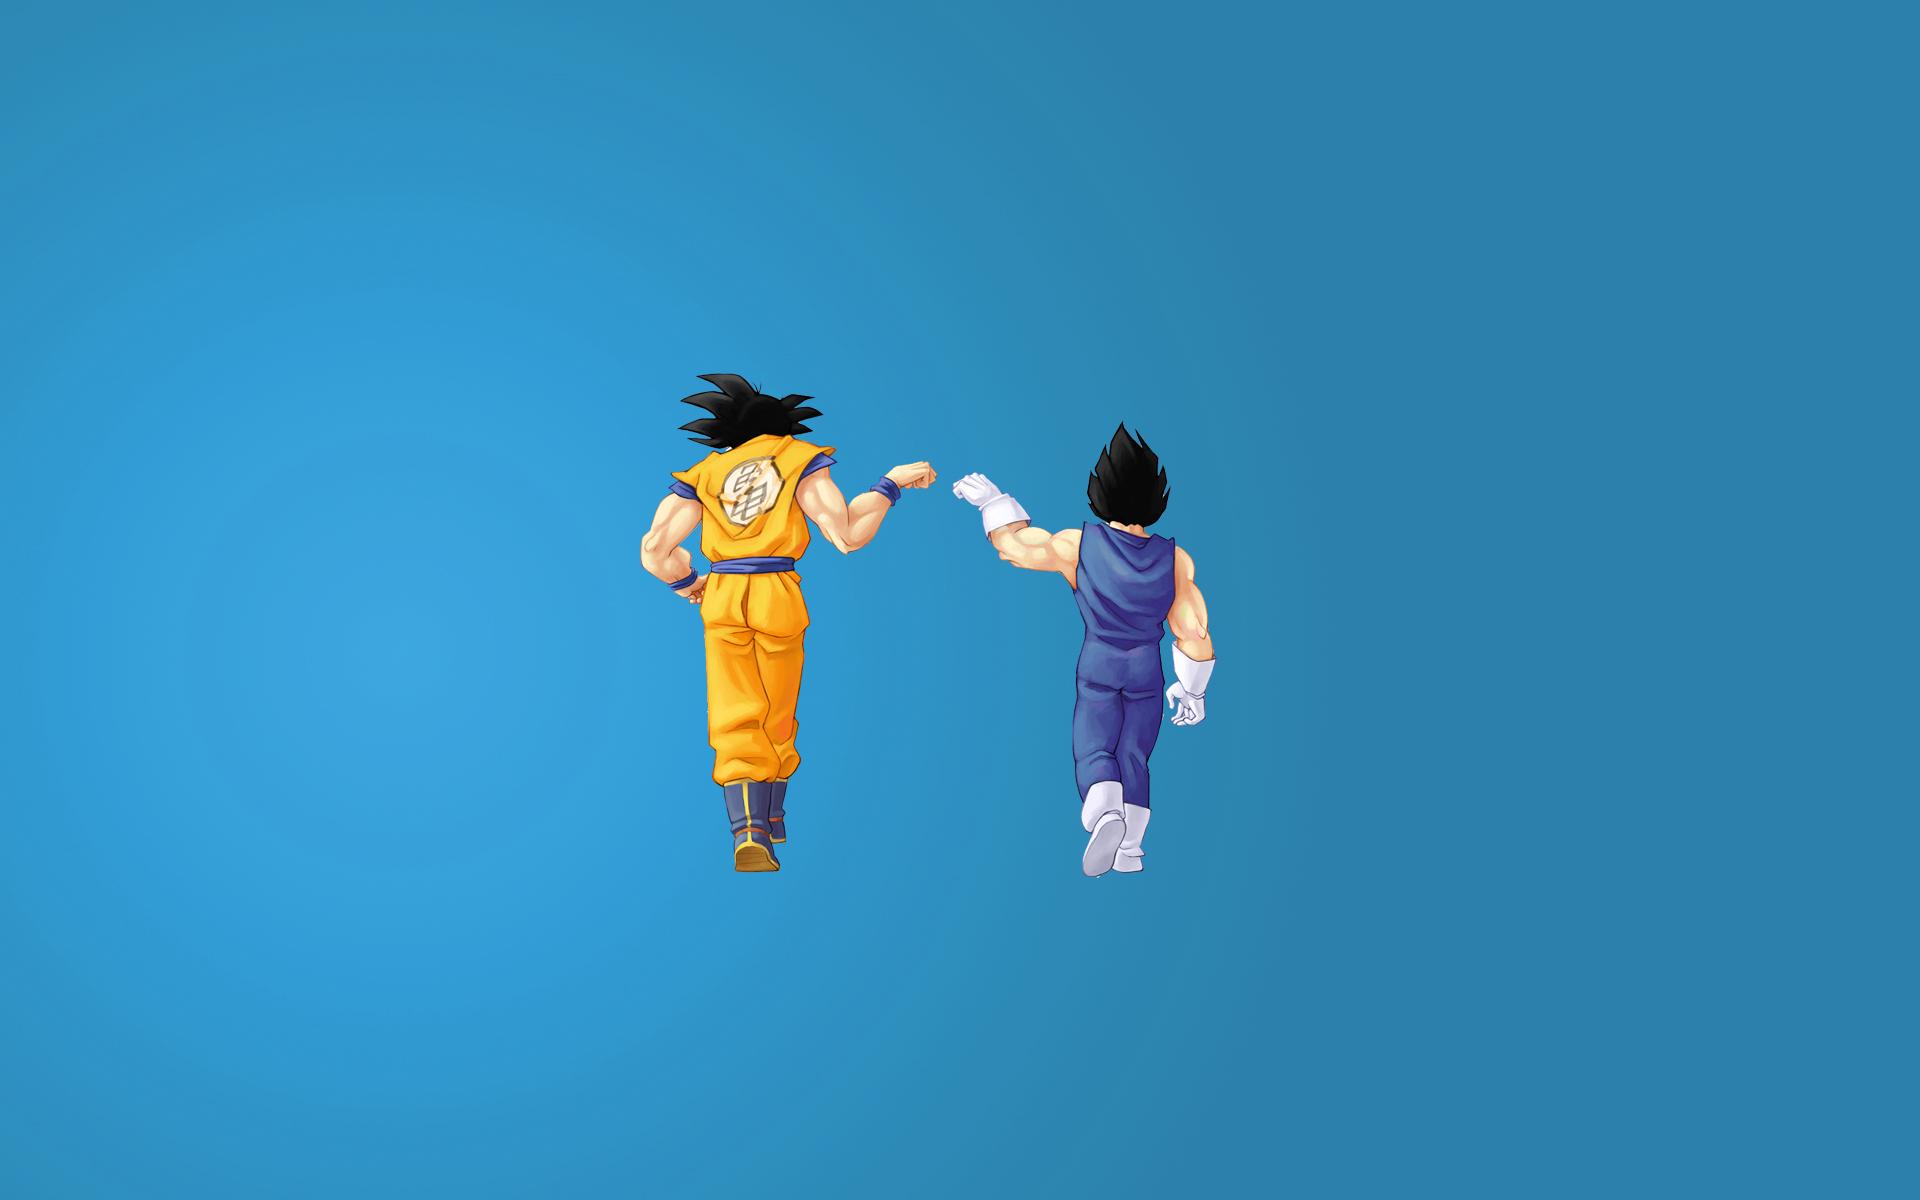 Ve a Goku Dragon Ball Z Free Wallpaper WallpaperJam